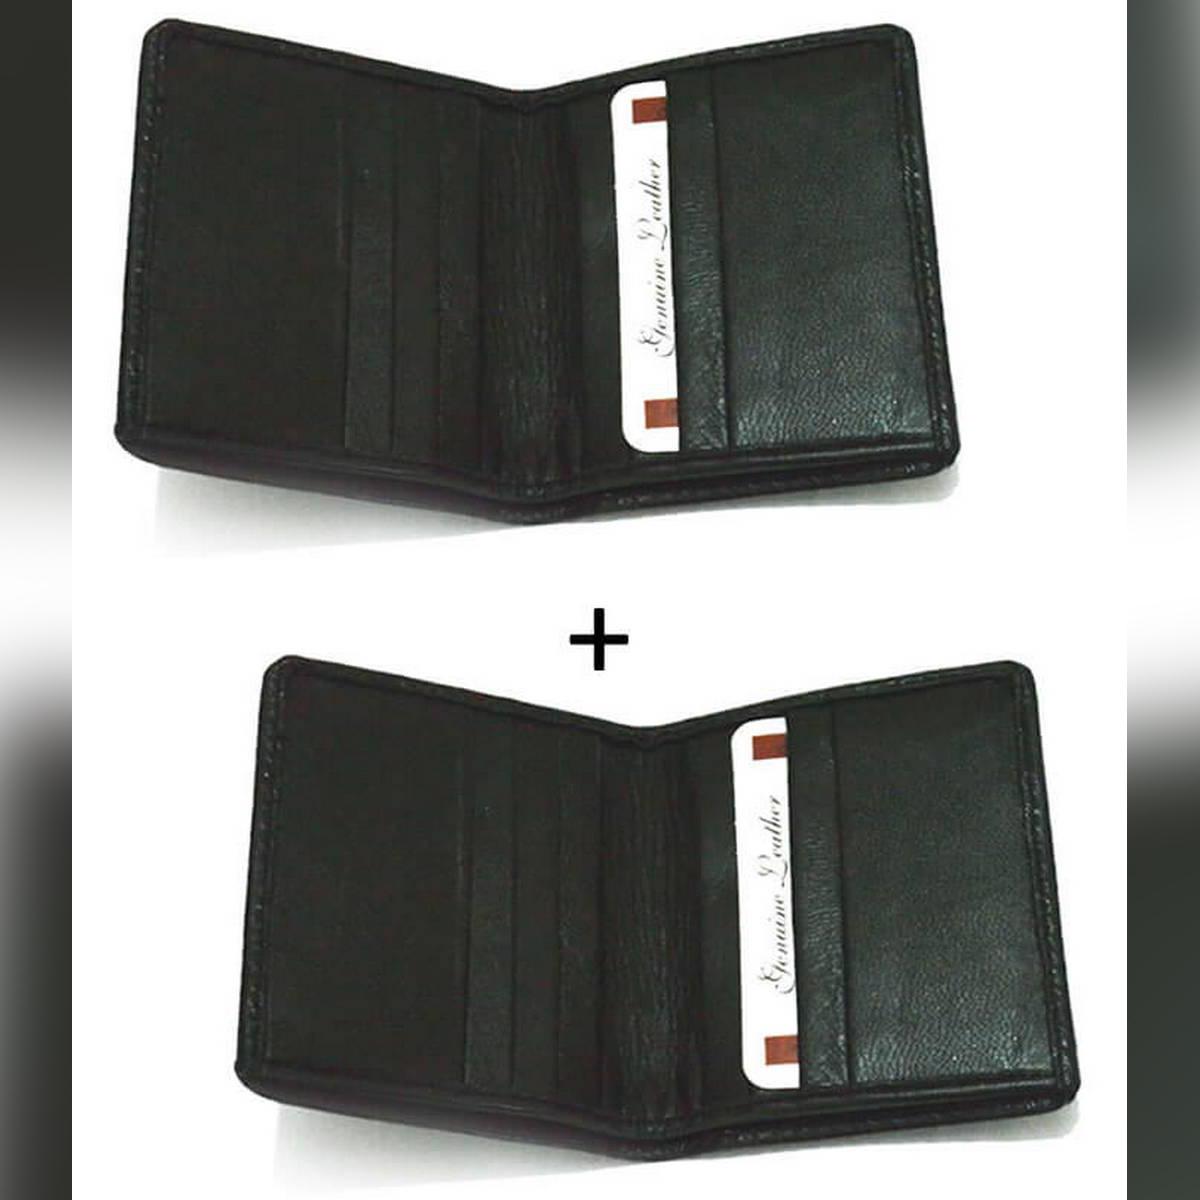 Pack of 2 -BACK Leather wallet Slim AND Soft Card Holder For Men & Women